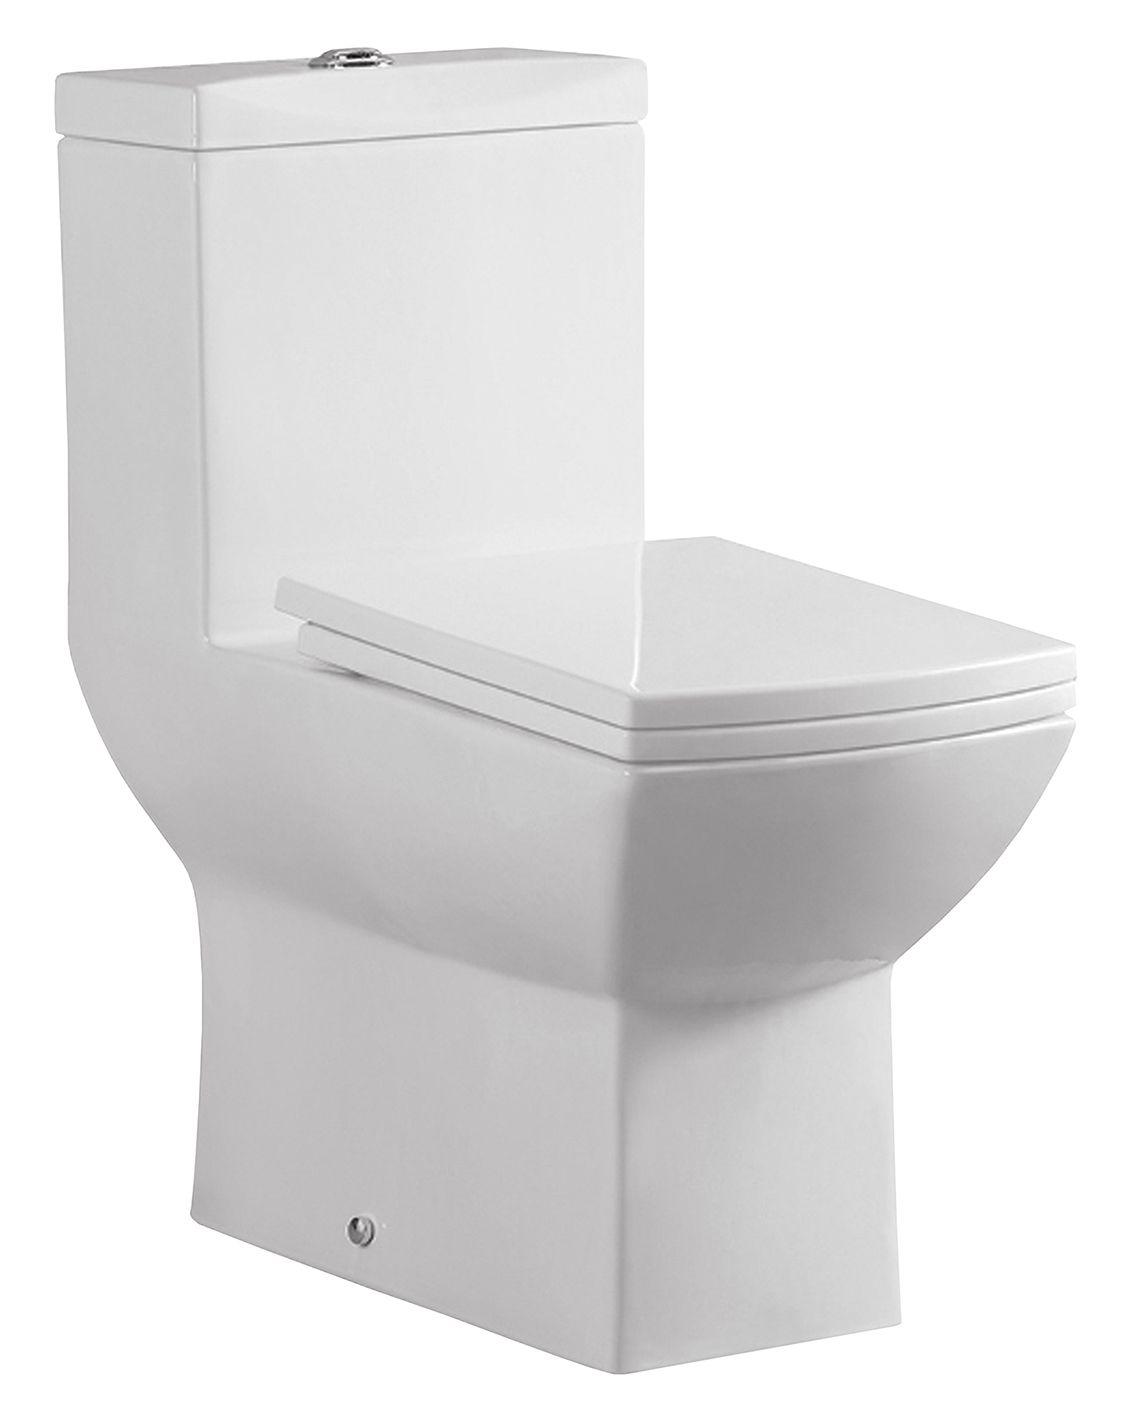 Vaso sanitário caixa acoplada Reno R 400